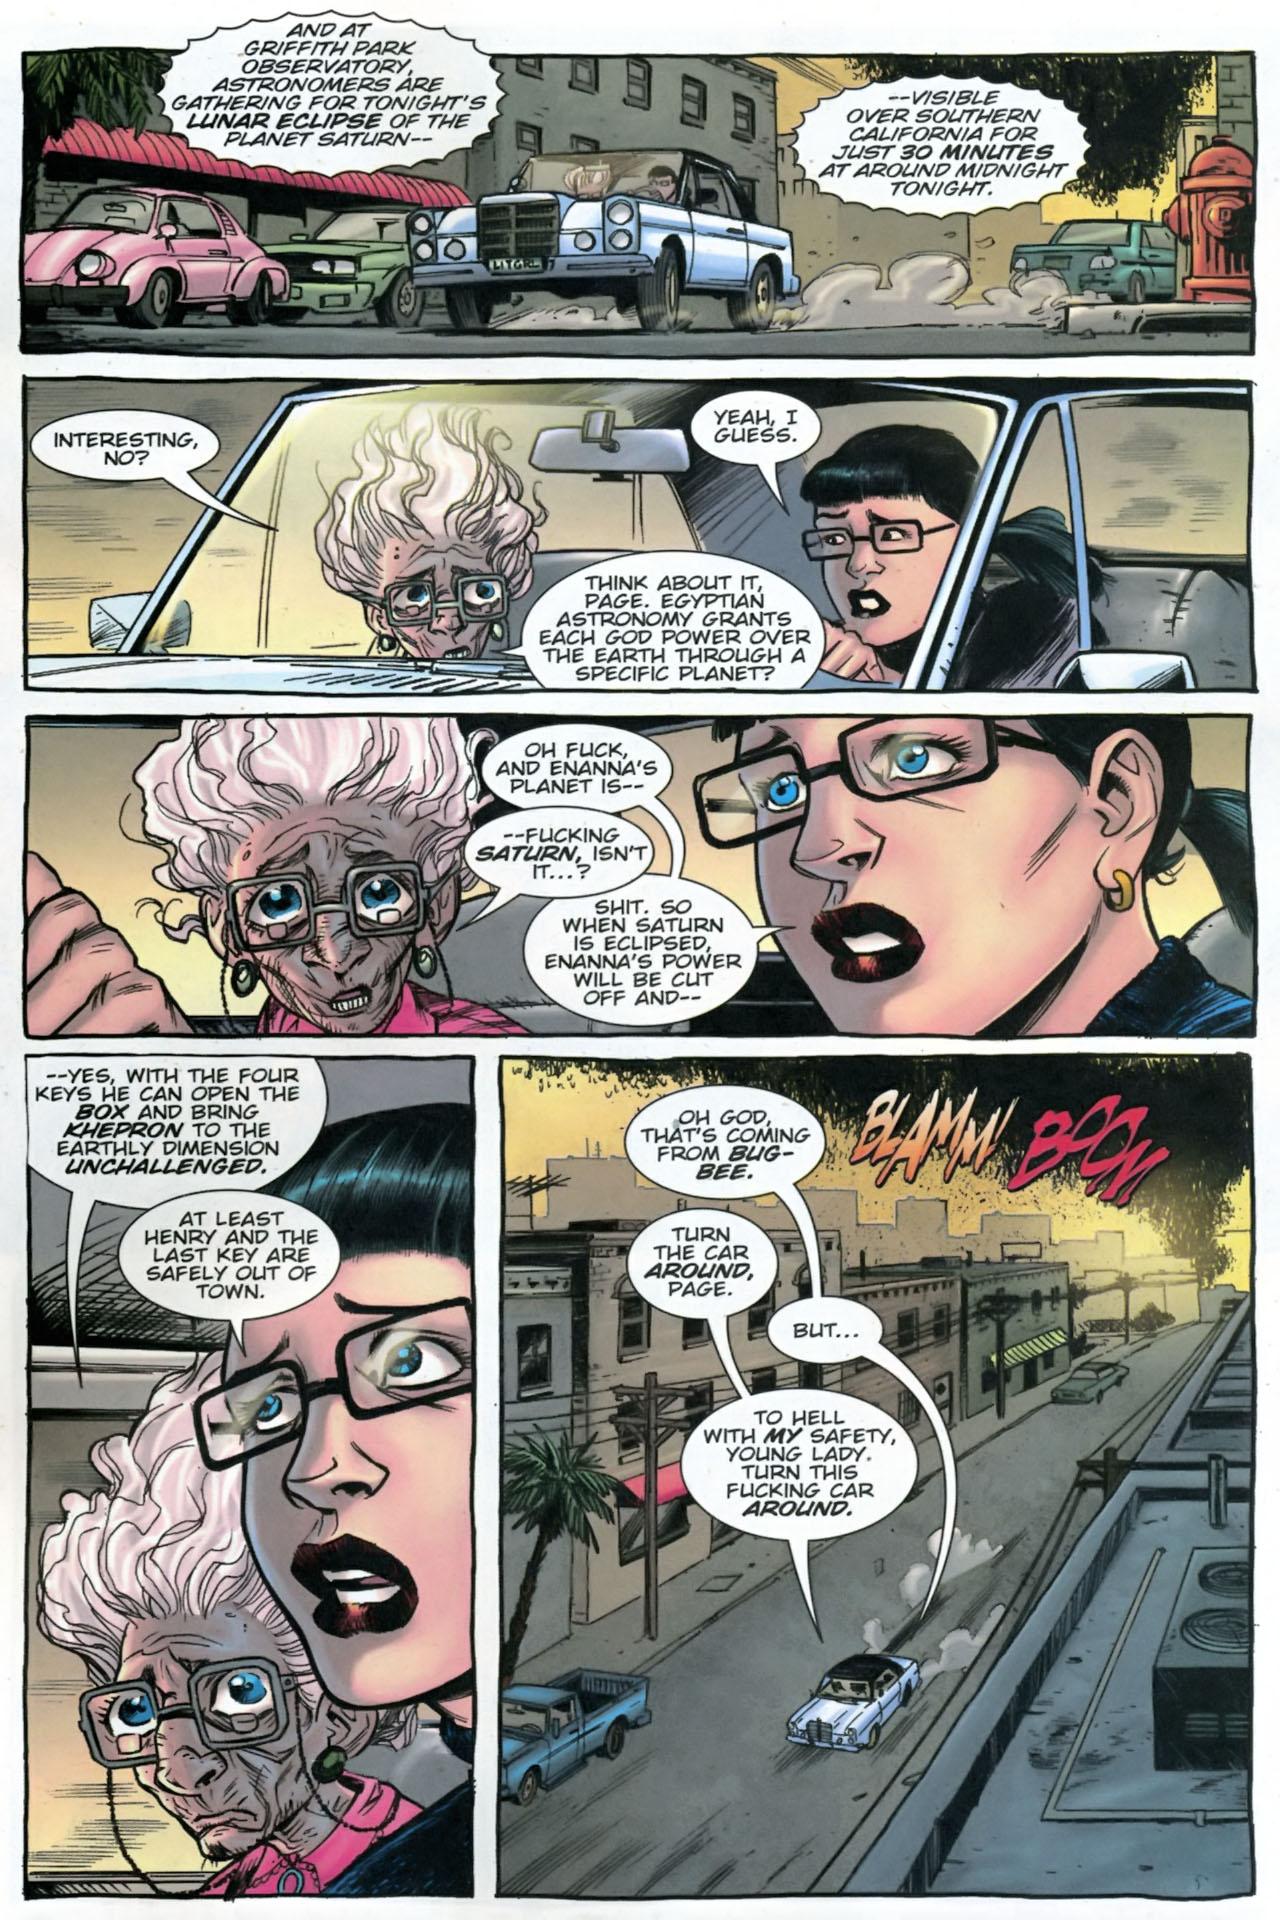 Read online The Exterminators comic -  Issue #28 - 19